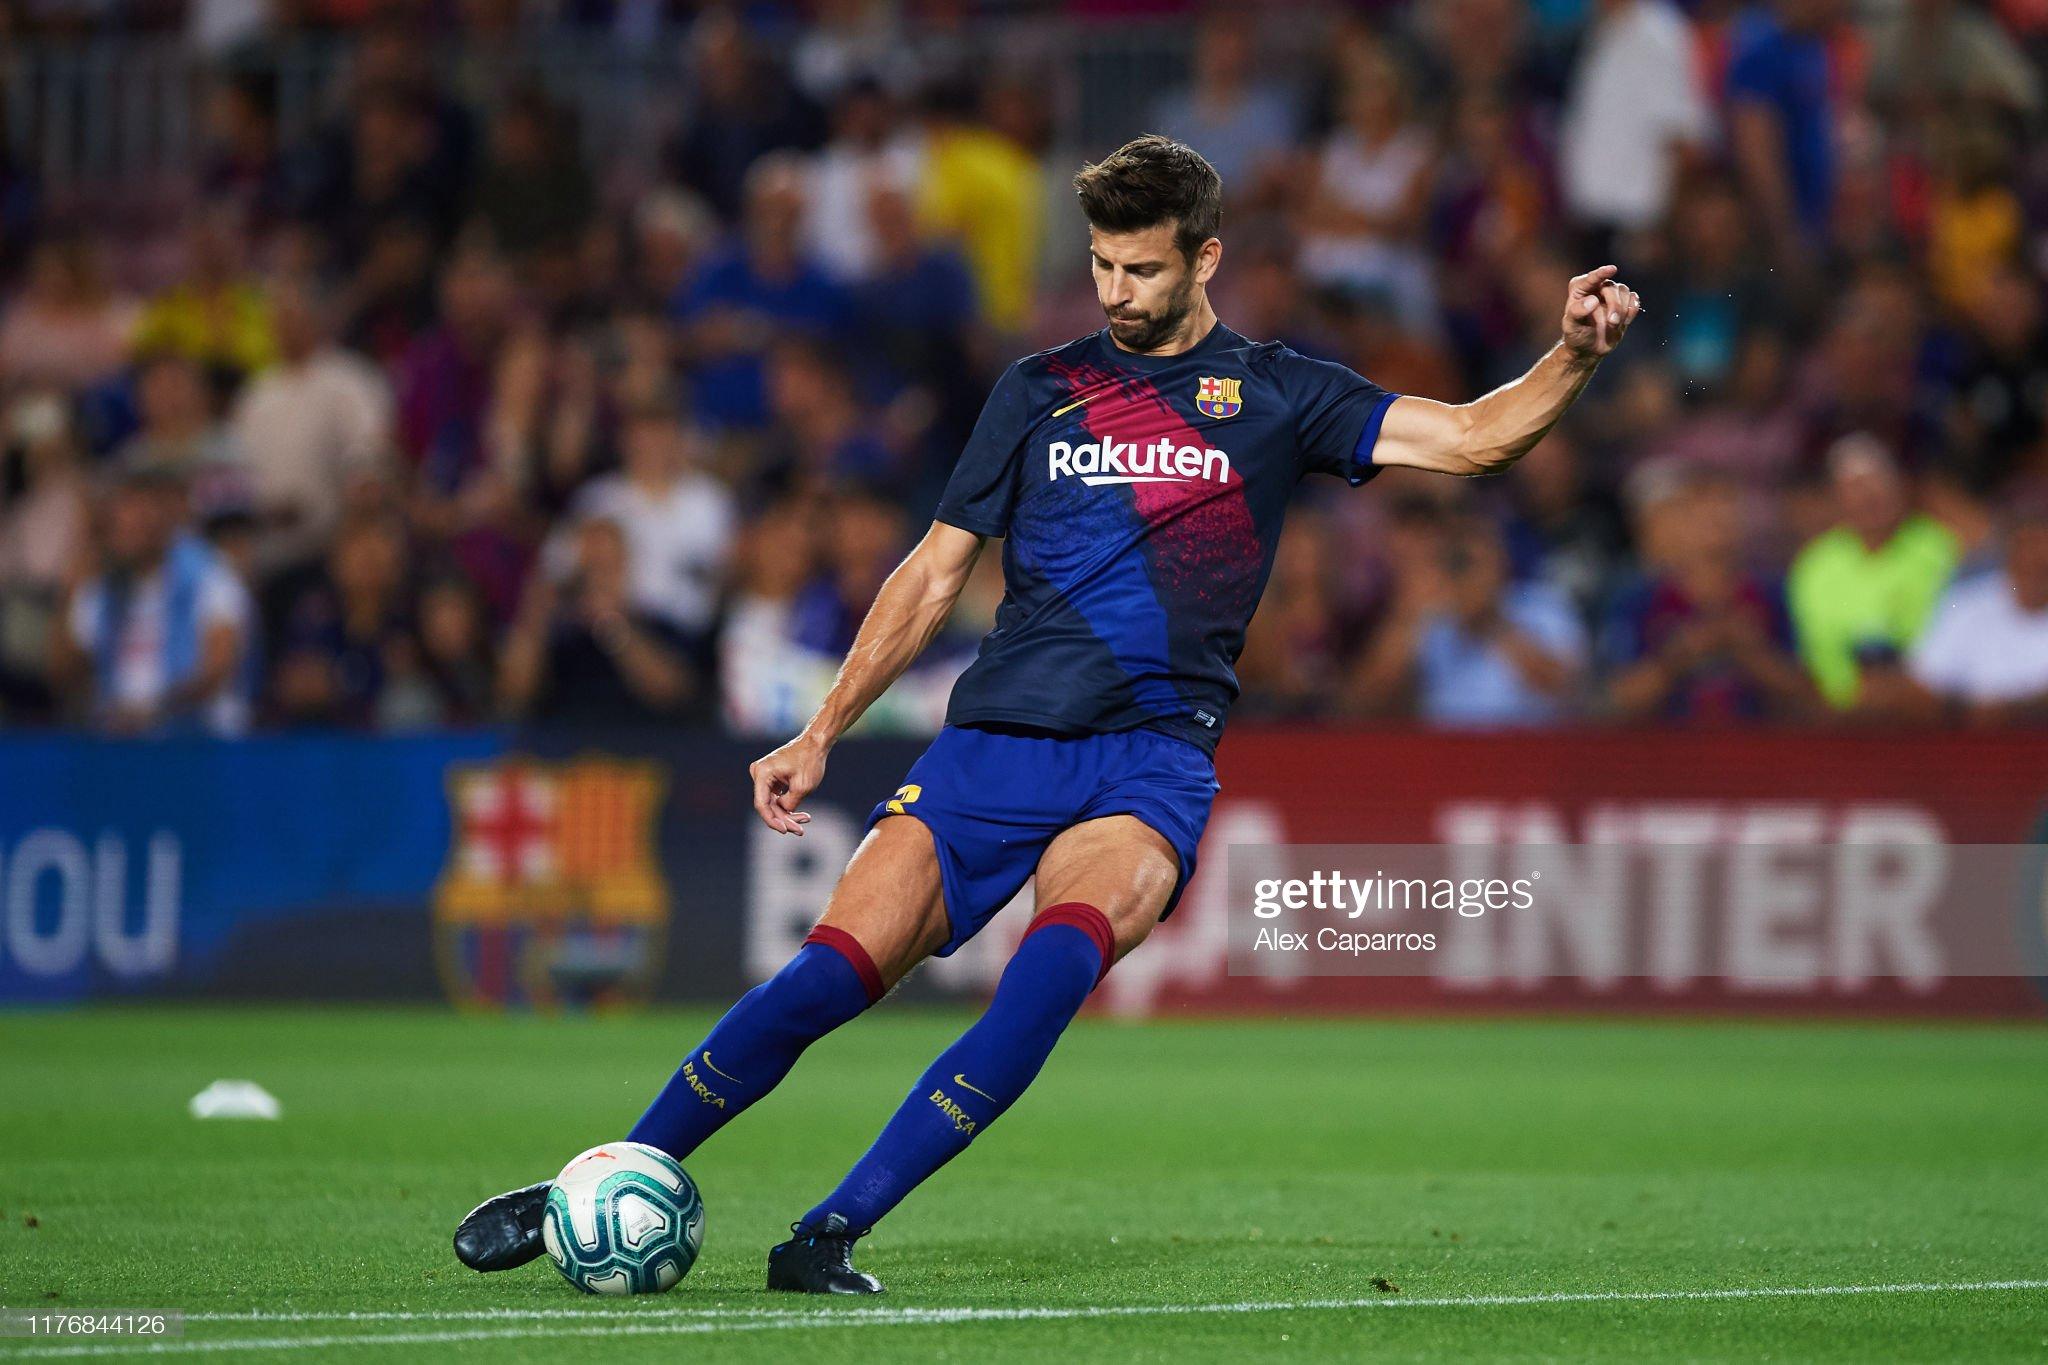 صور مباراة : برشلونة - فياريال 2-1 ( 24-09-2019 )  Gerard-pique-of-fc-barcelona-warms-up-before-the-liga-match-between-picture-id1176844126?s=2048x2048